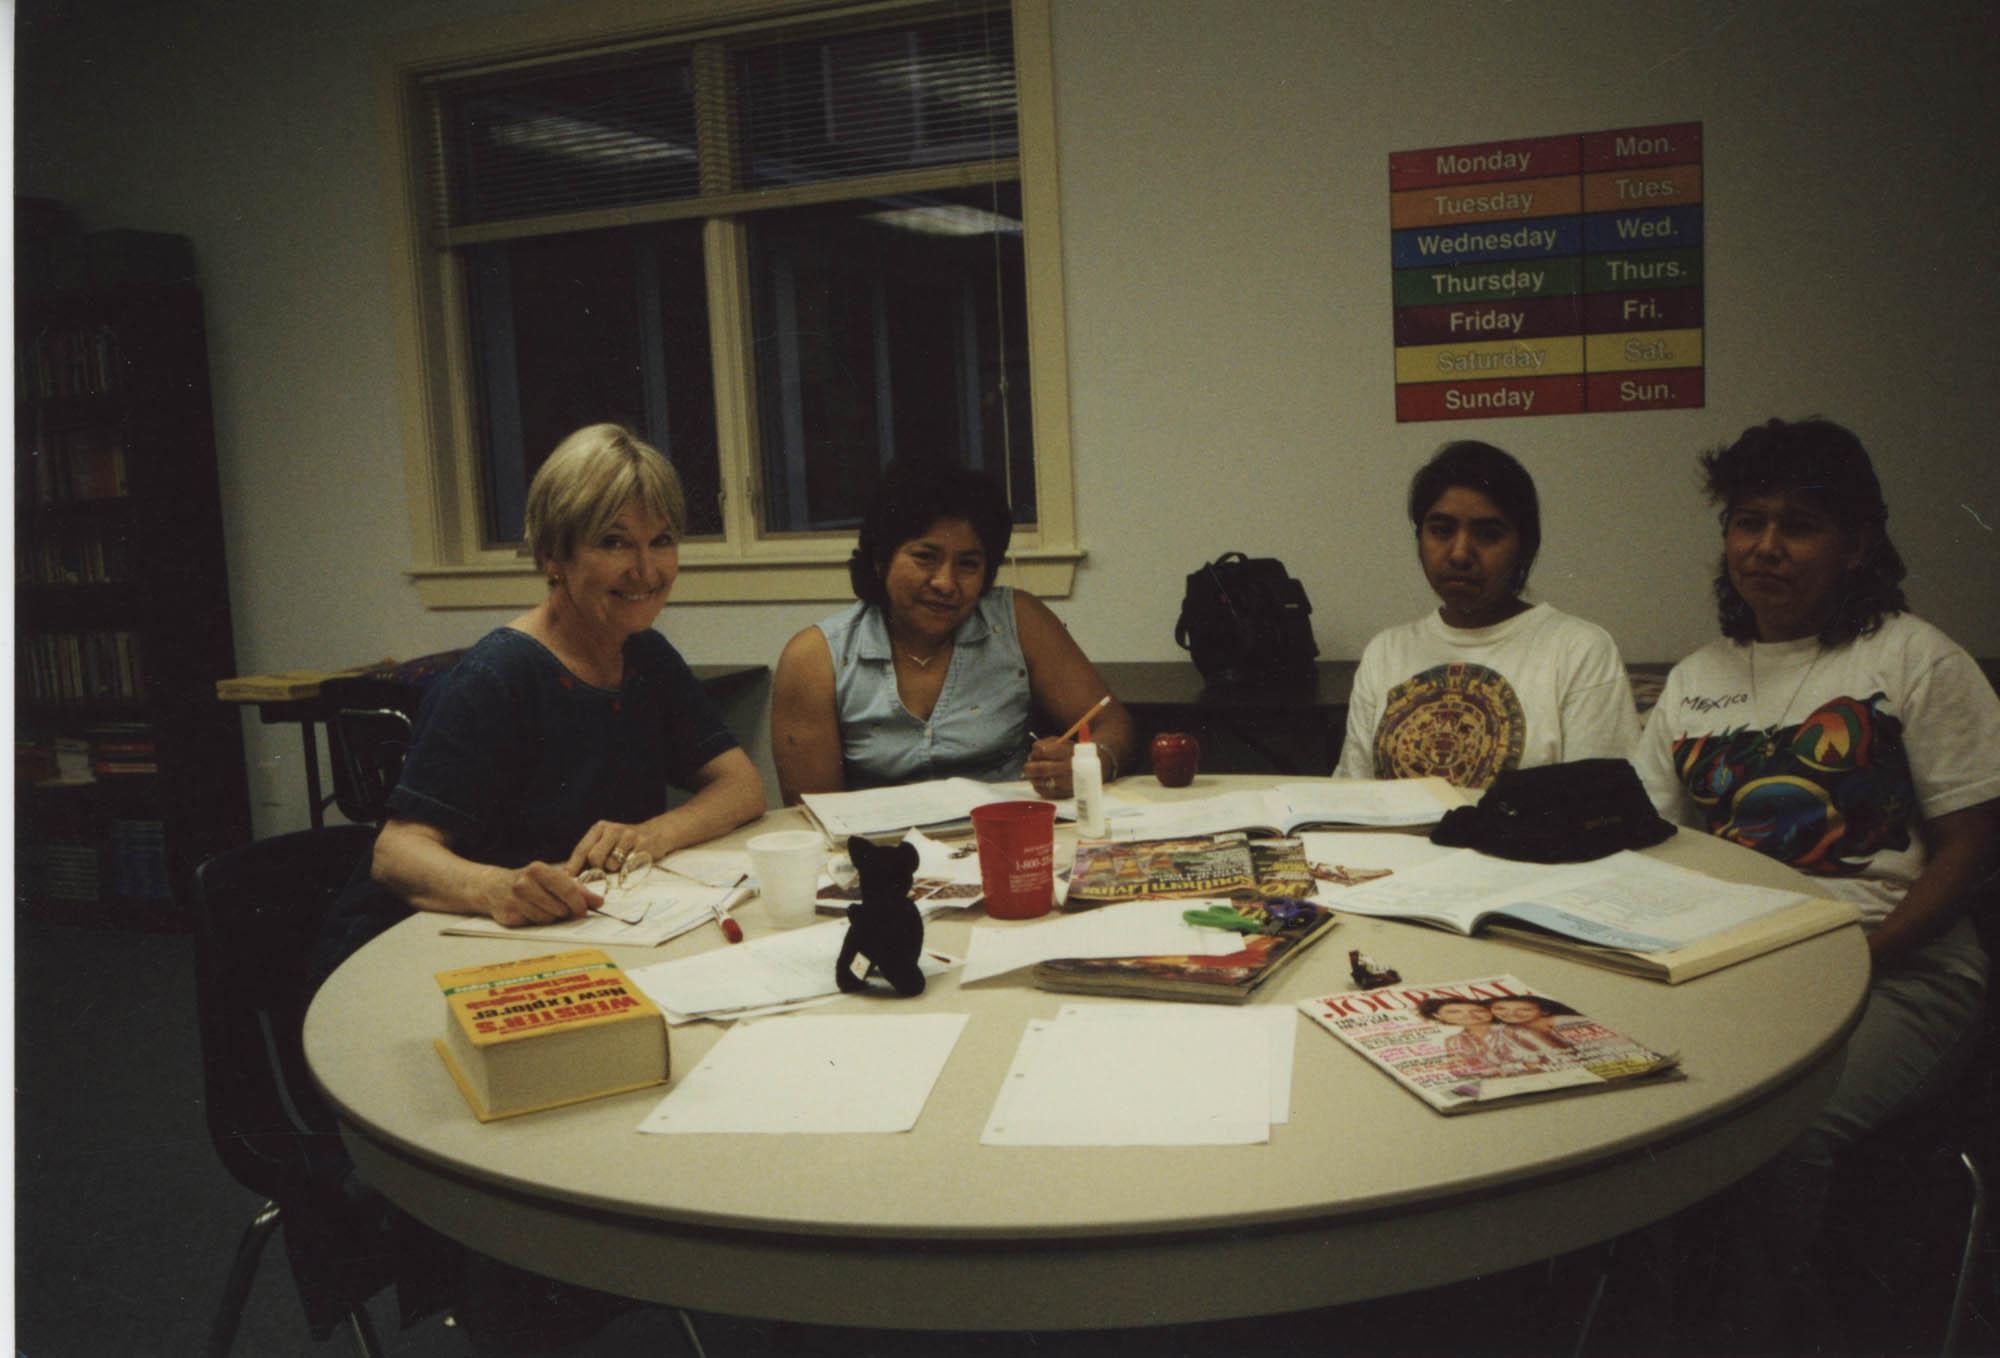 Fotografía de mujeres en una clase de inglés / Photograph of Women in an English Class